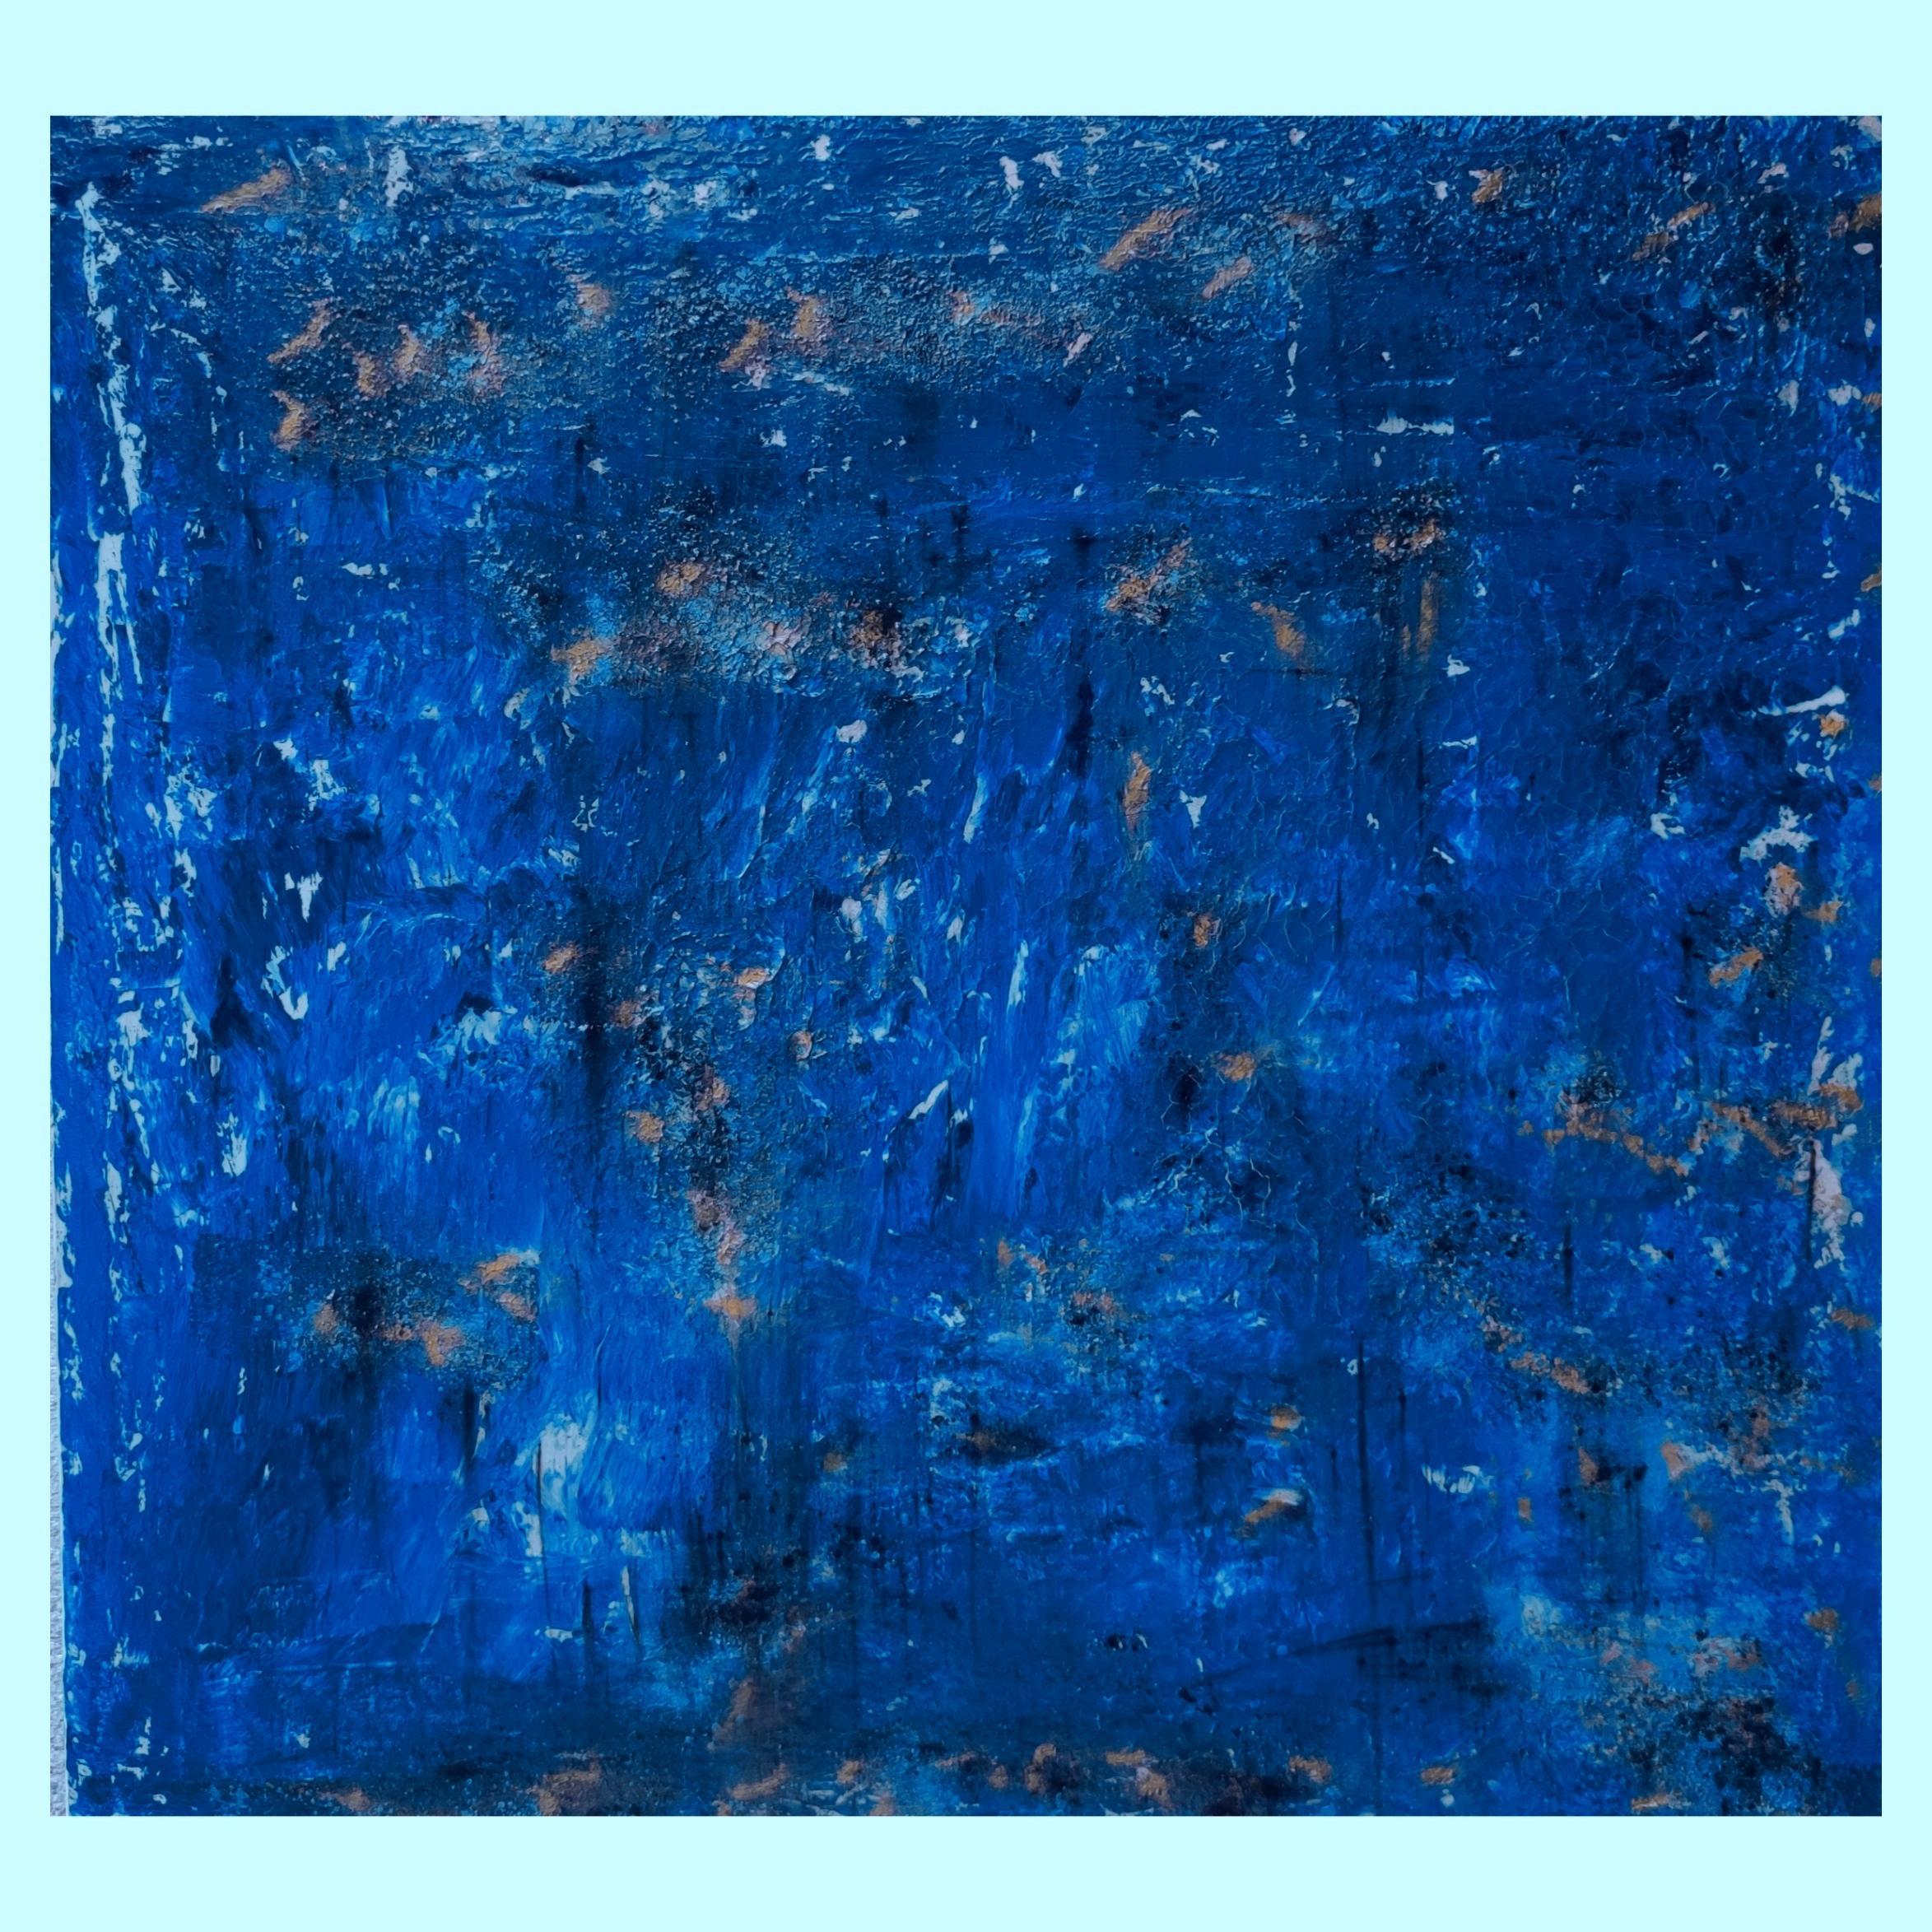 Abstract informal - Stardust